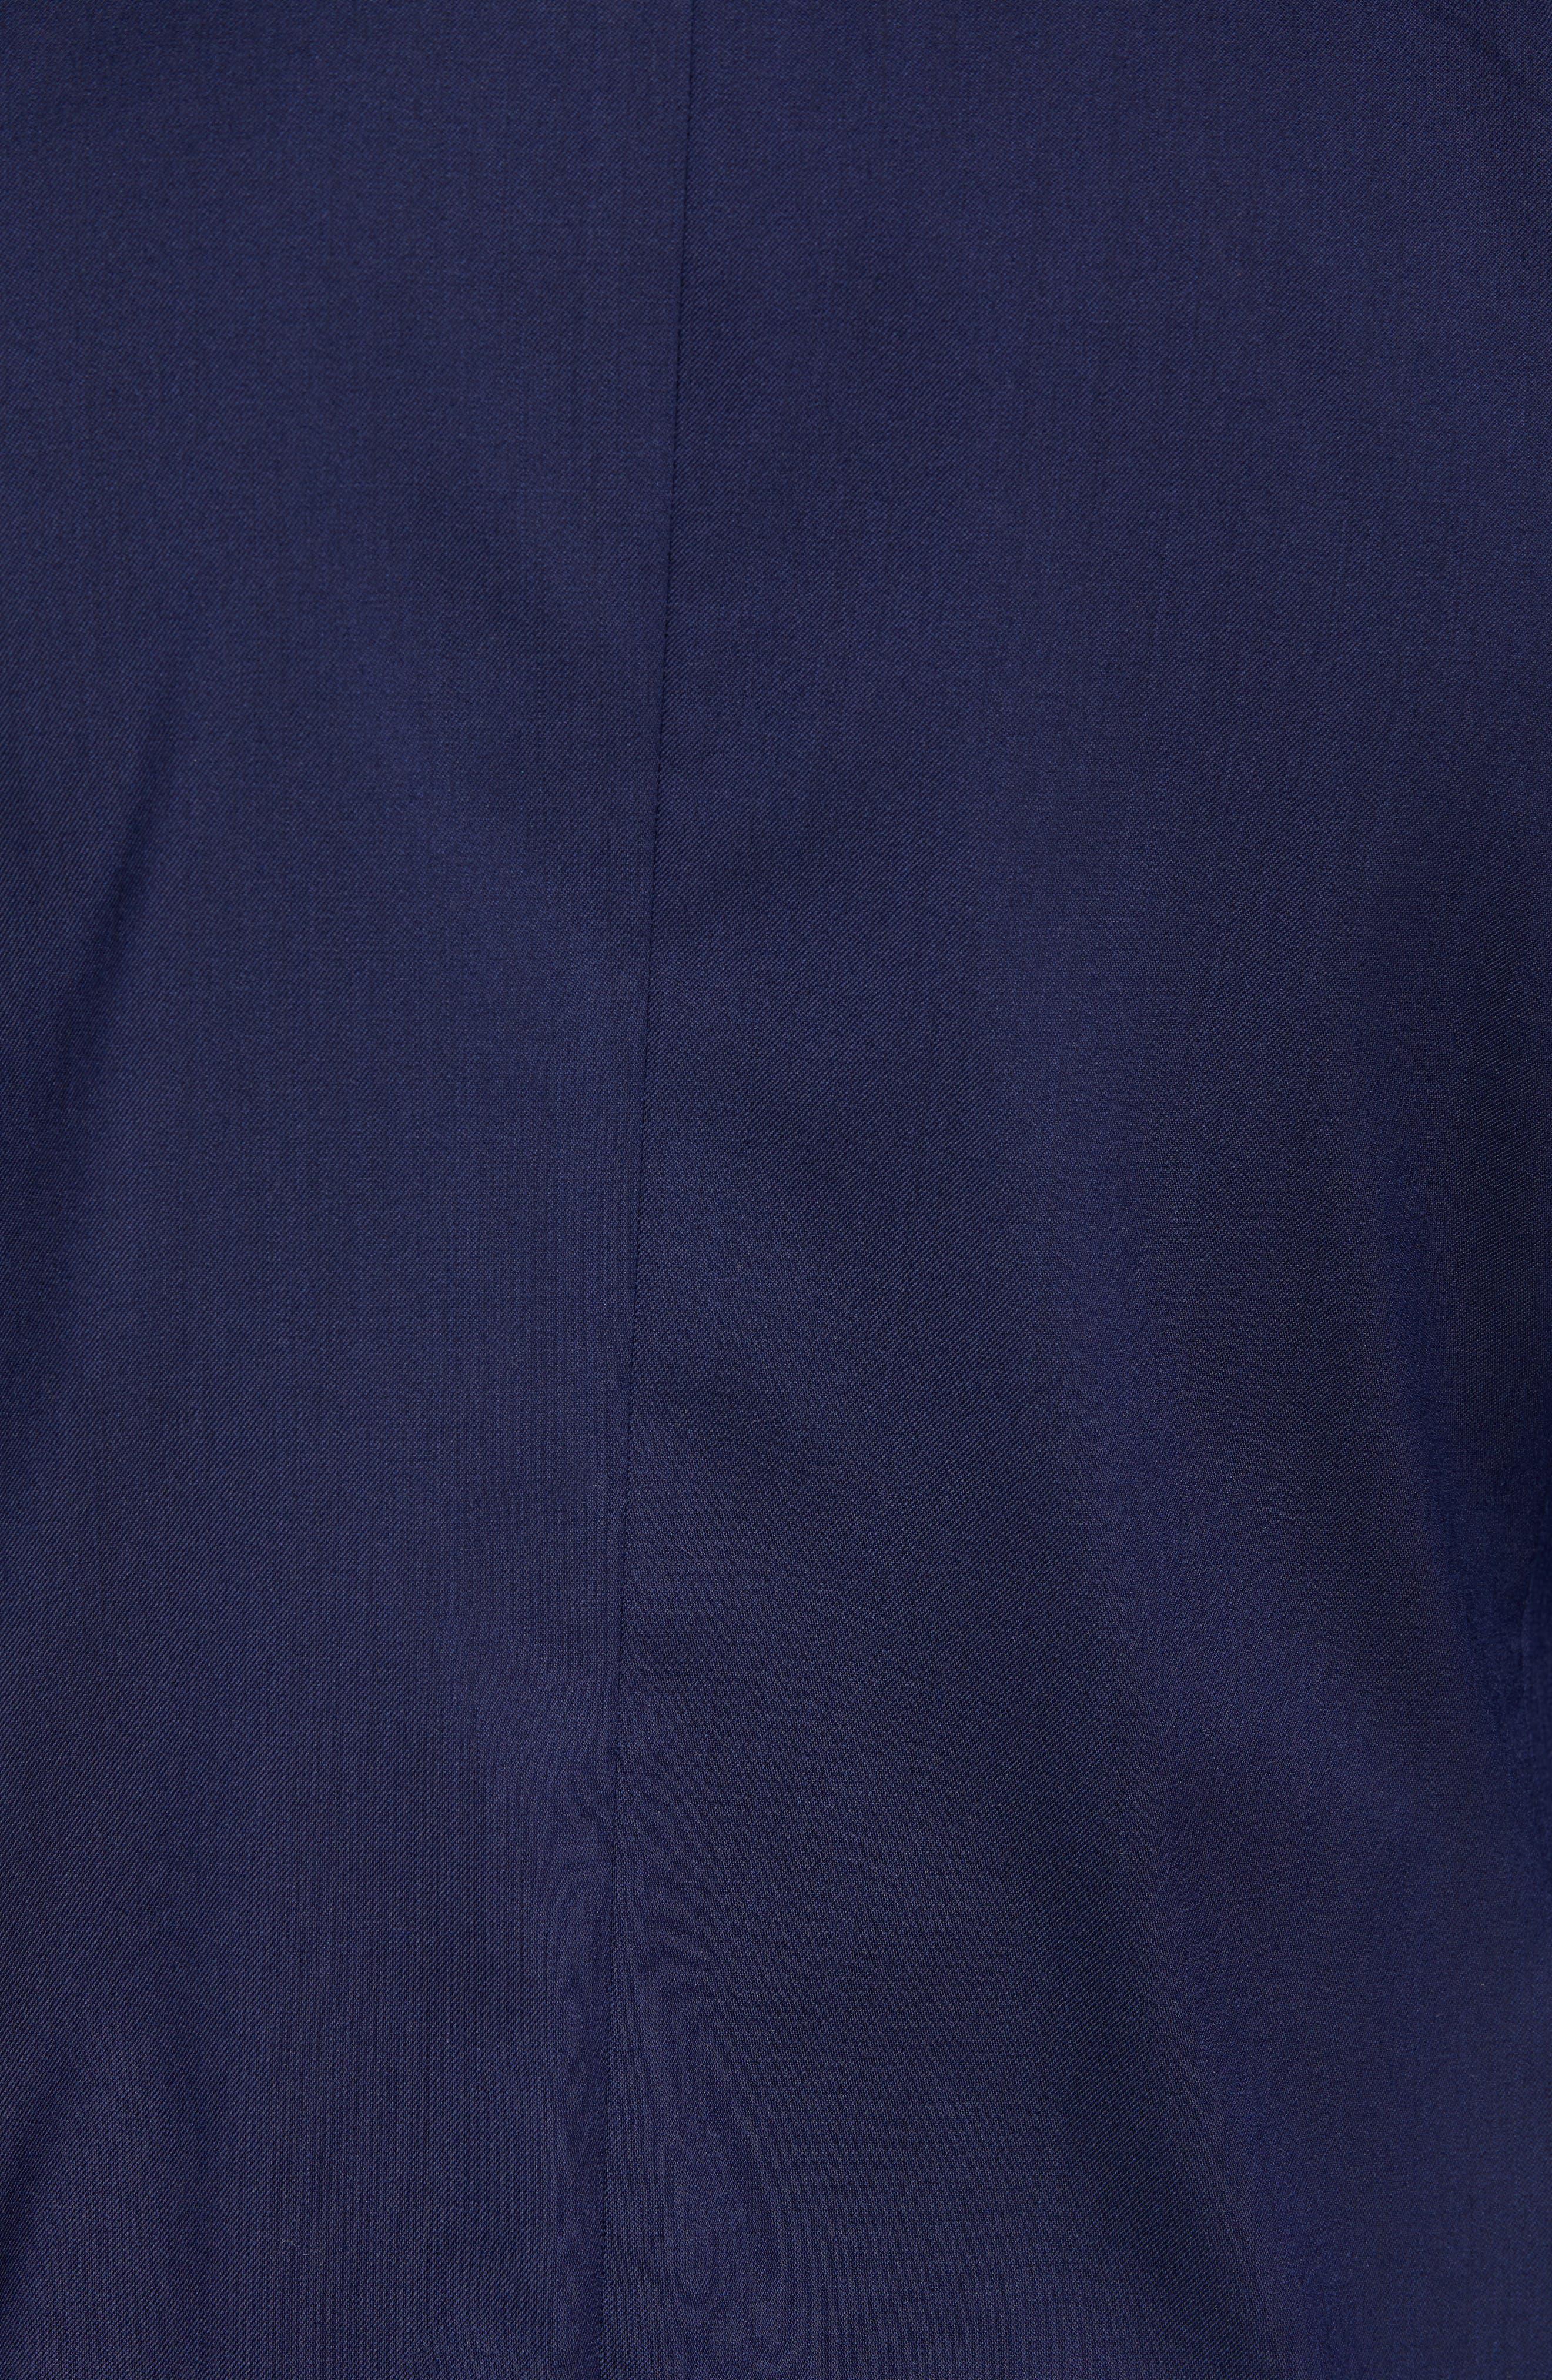 Capstone Slim Fit Tuxedo Trousers,                             Alternate thumbnail 5, color,                             NAVY